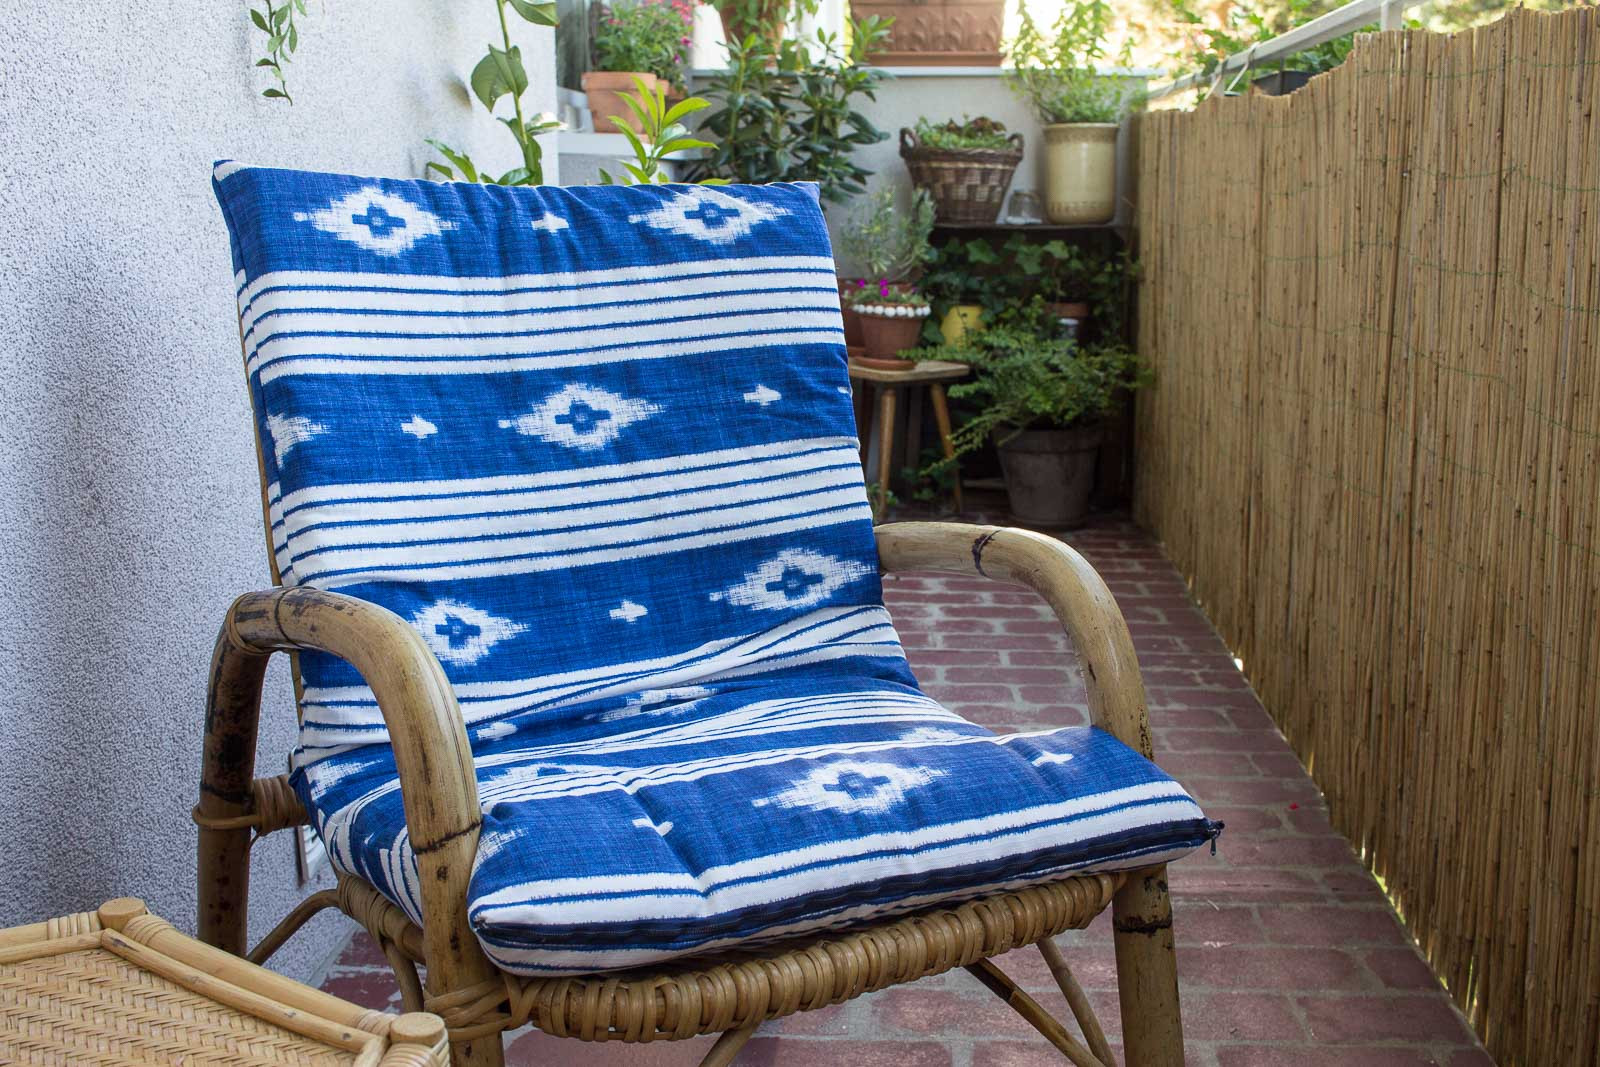 Sessel Diy  Überzug für Sessel nähen Green Bird DIY Mode Deko und